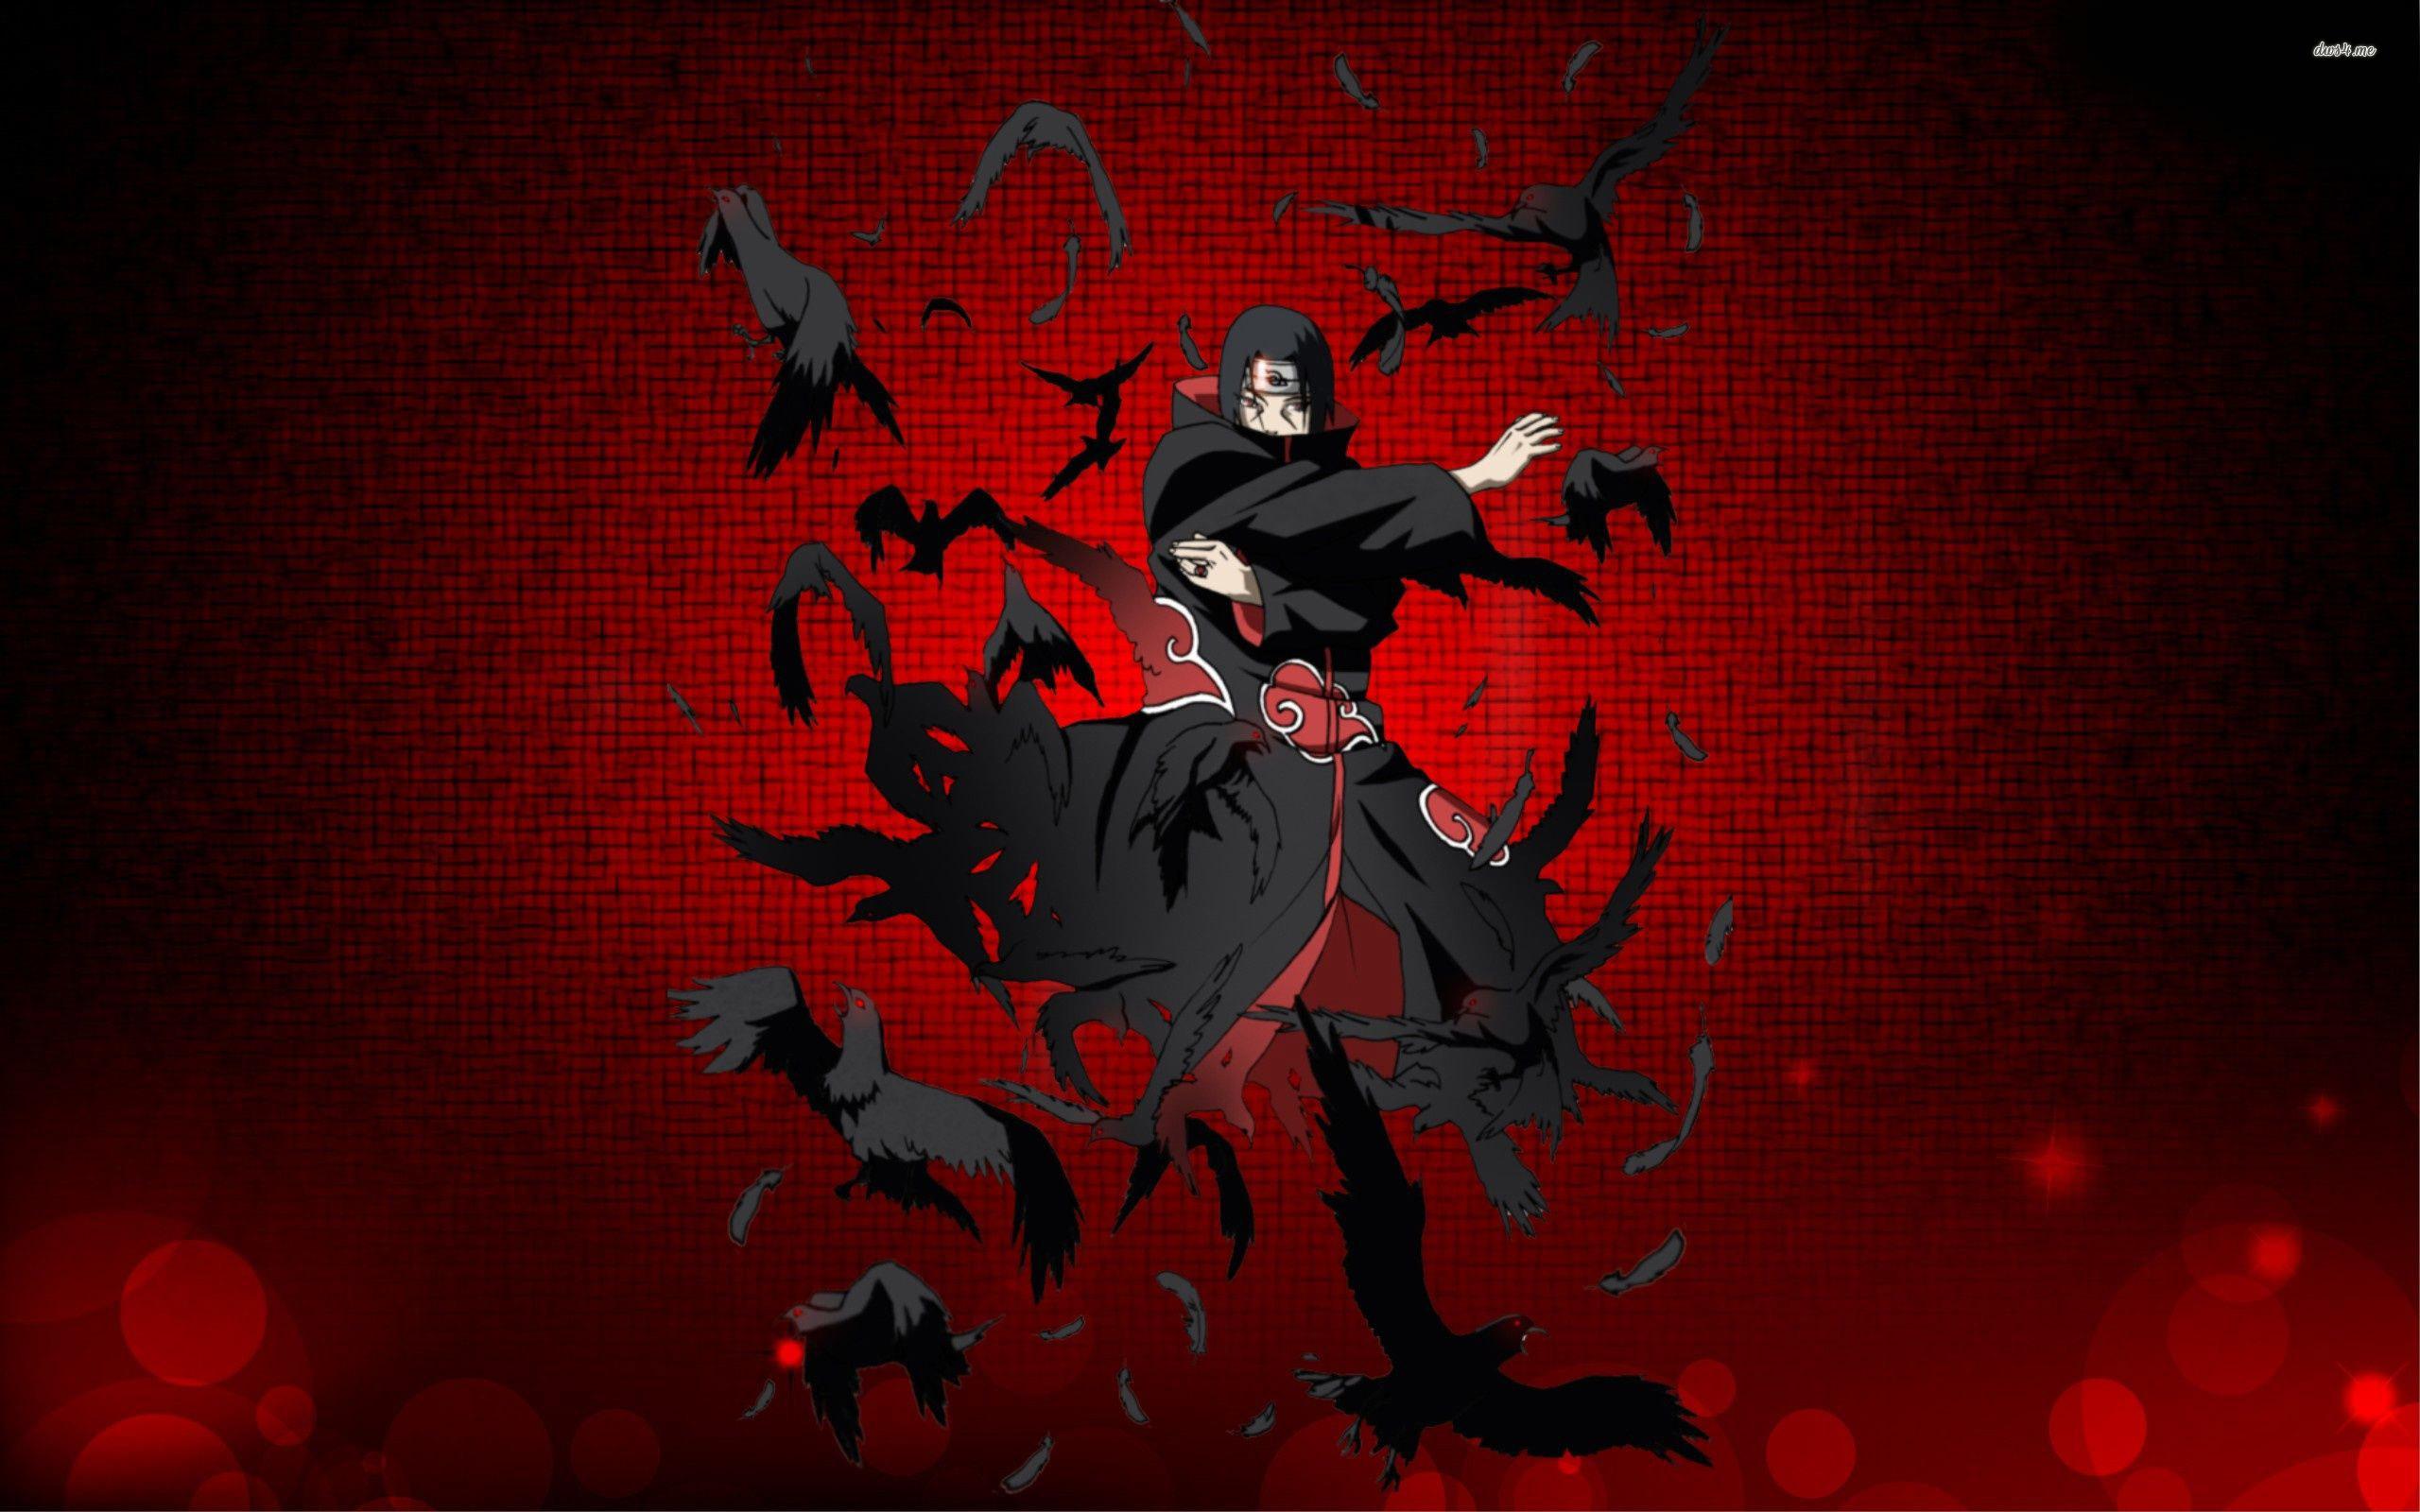 Itachi Uchiha   Naruto wallpaper   Anime wallpapers   19318 2560x1600